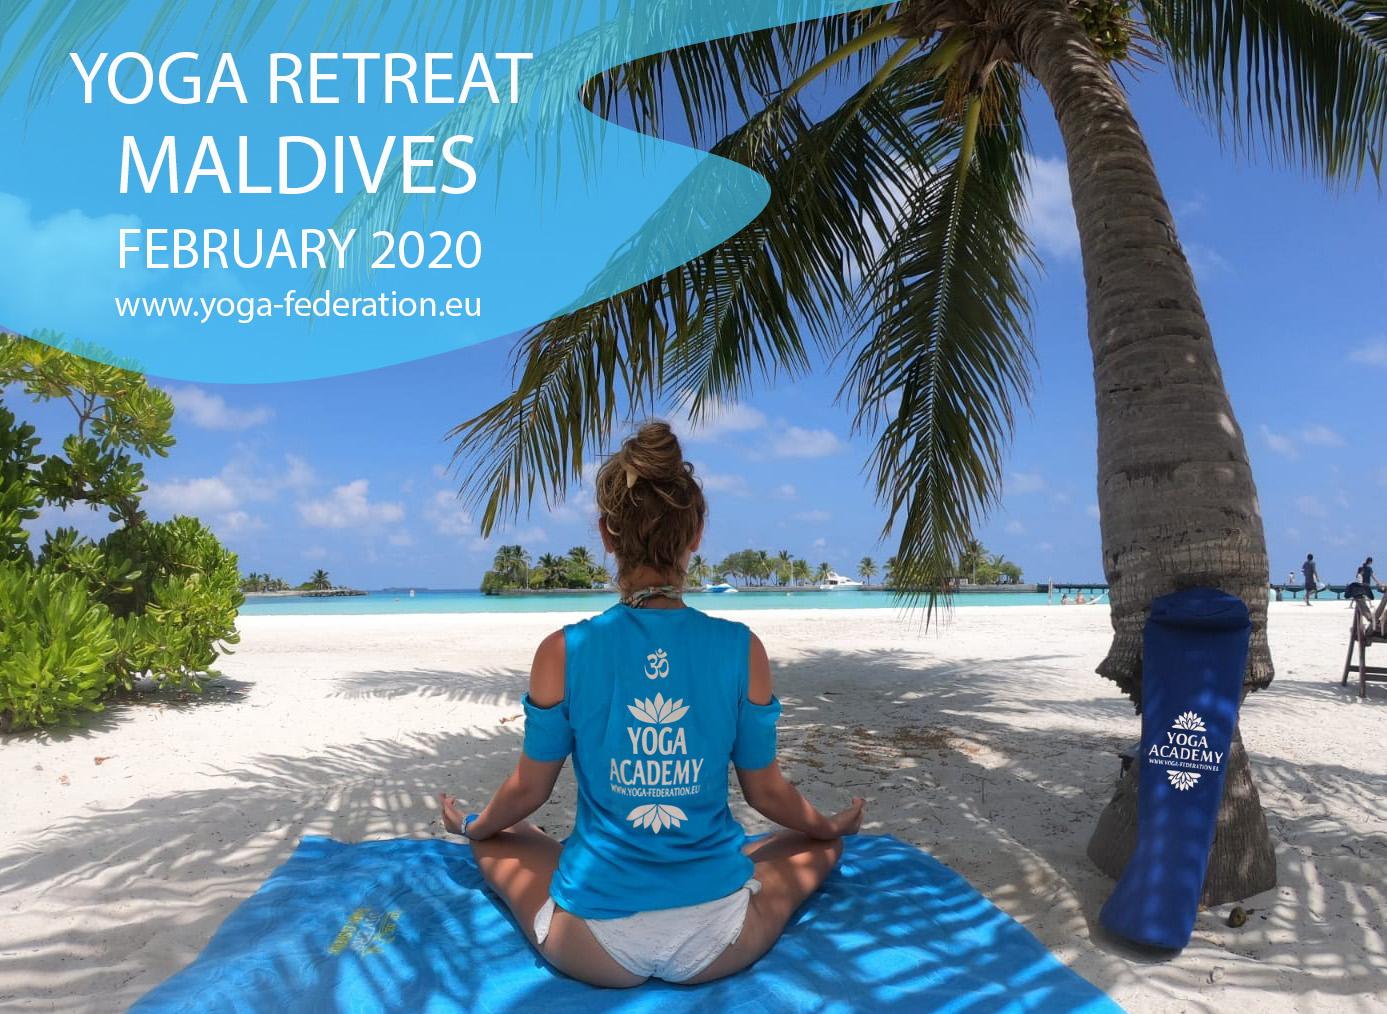 Yoga Retreat Maldives 2020 Yoga Federation Of Europe